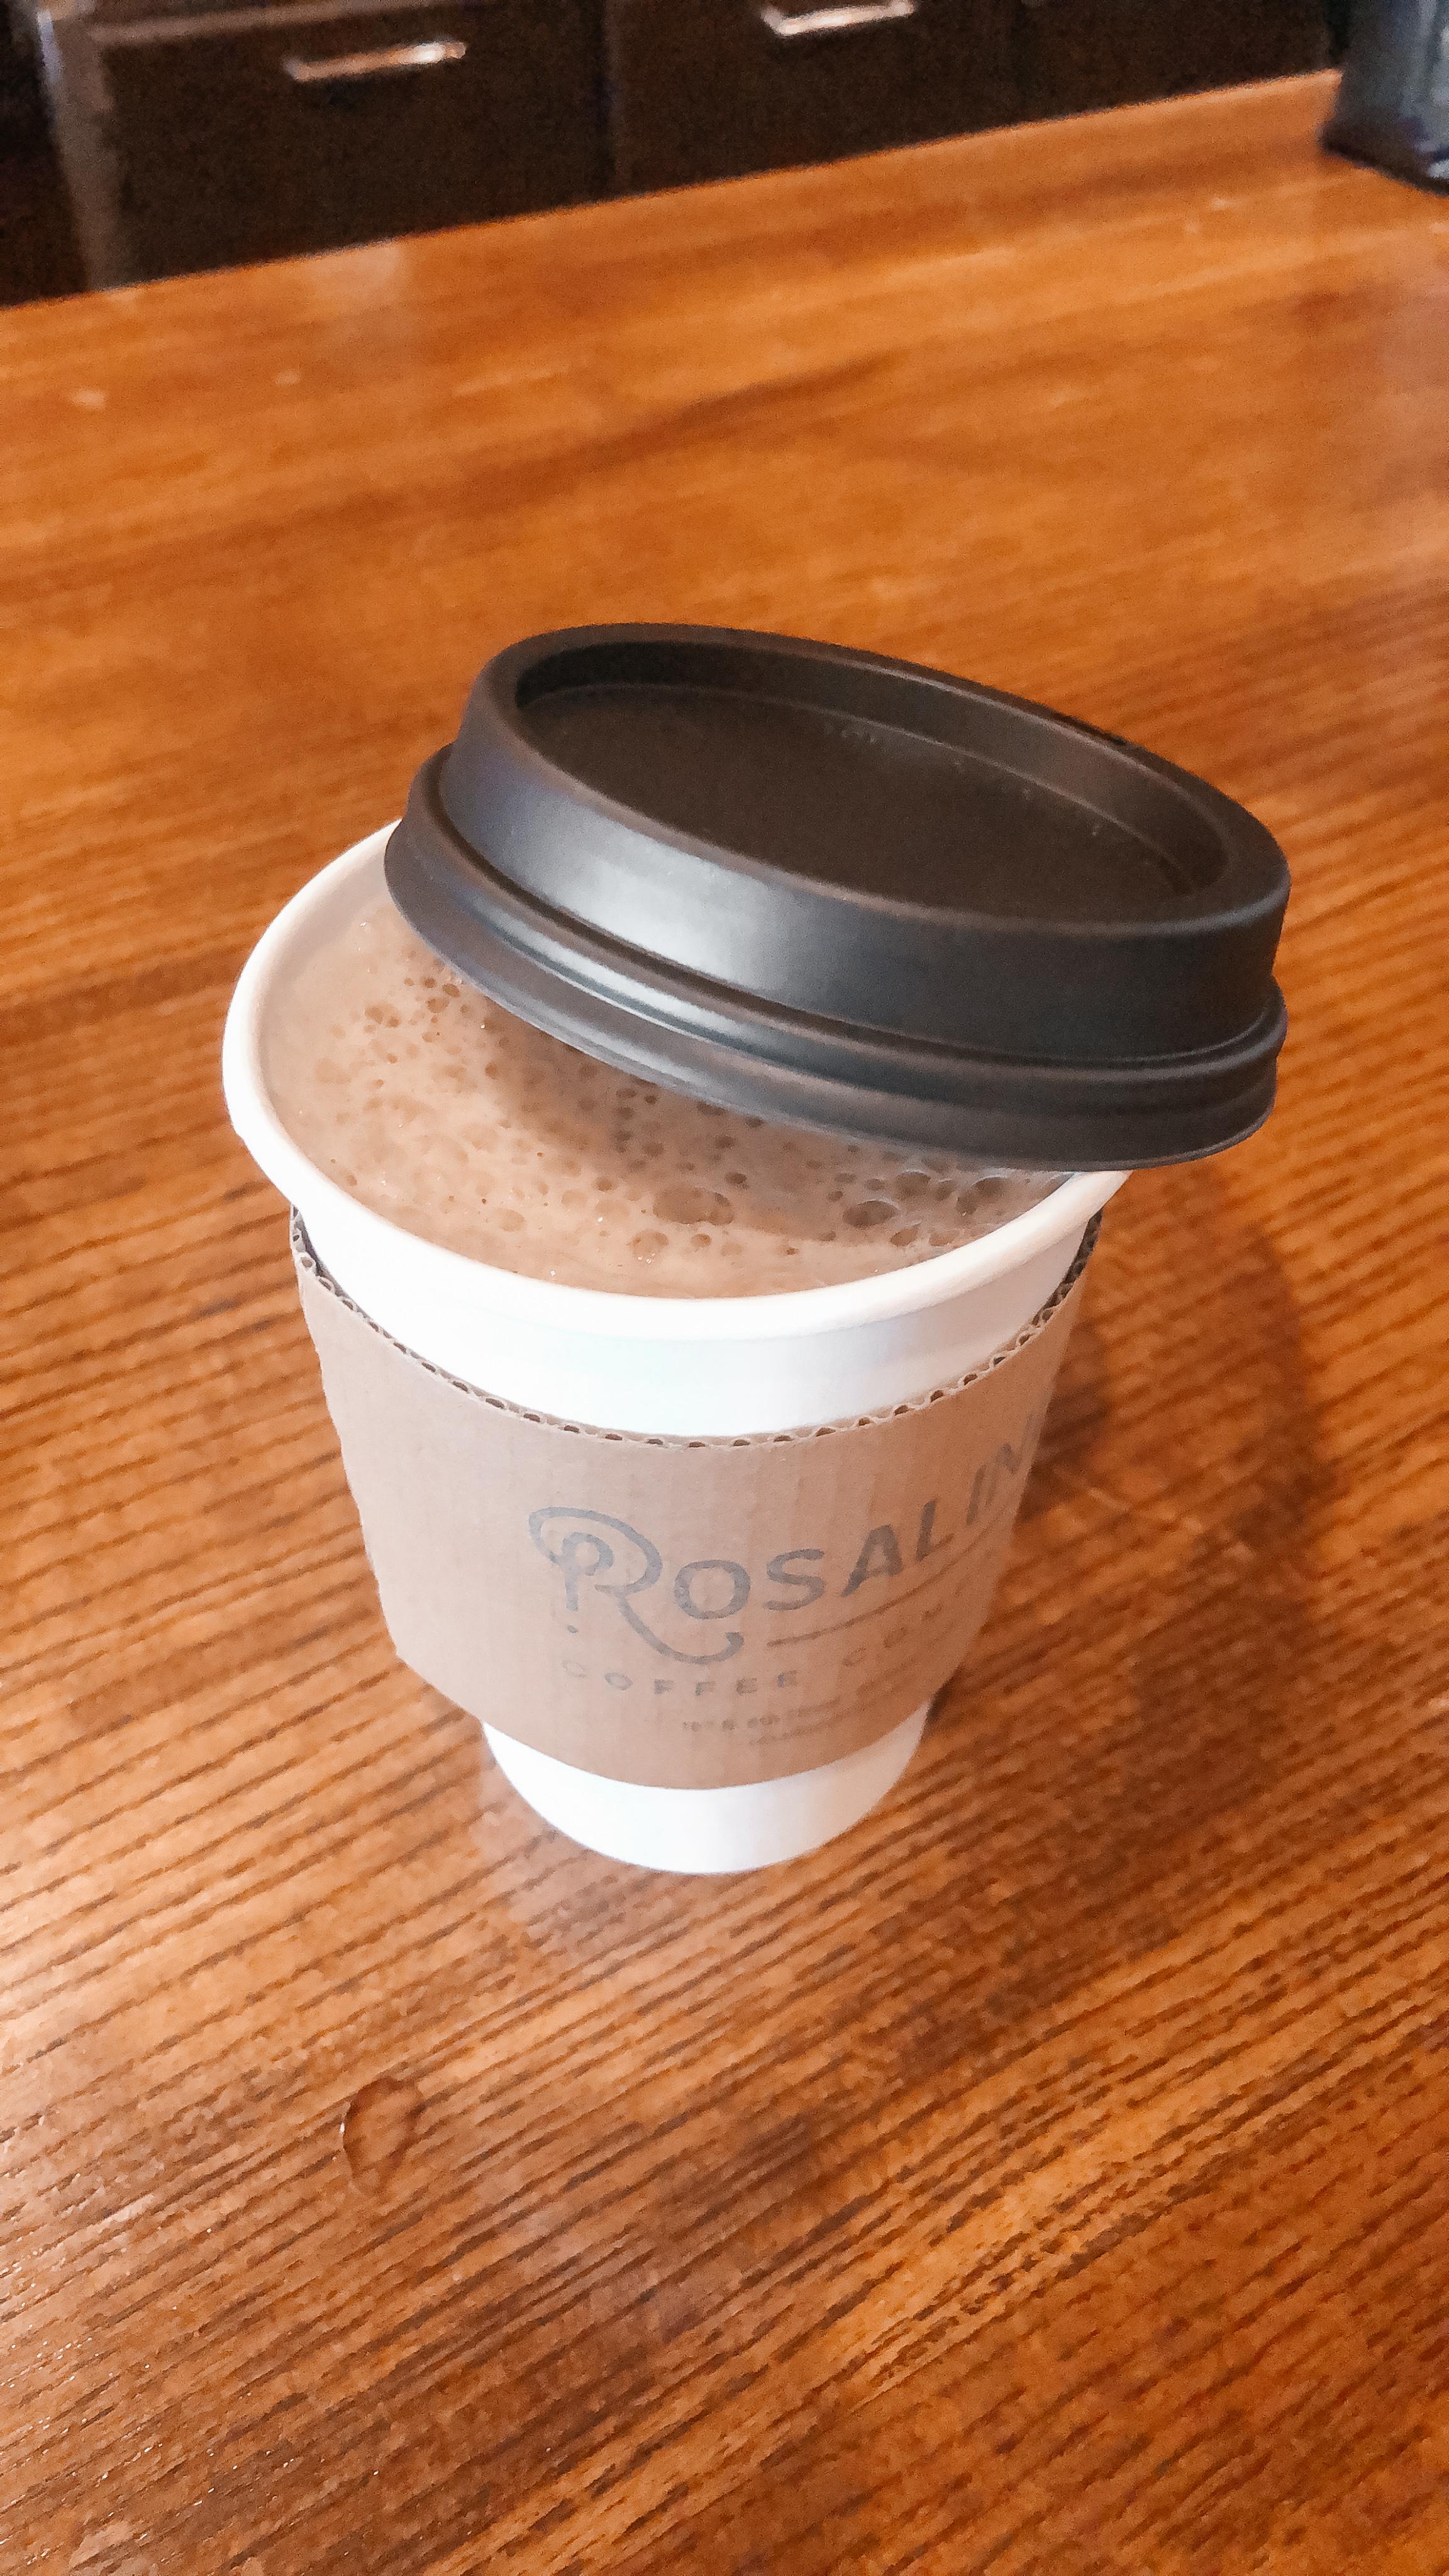 Rosalind Coffee in Garland 107 N 6th St, Garland, TX 75040 - Apple Chaider